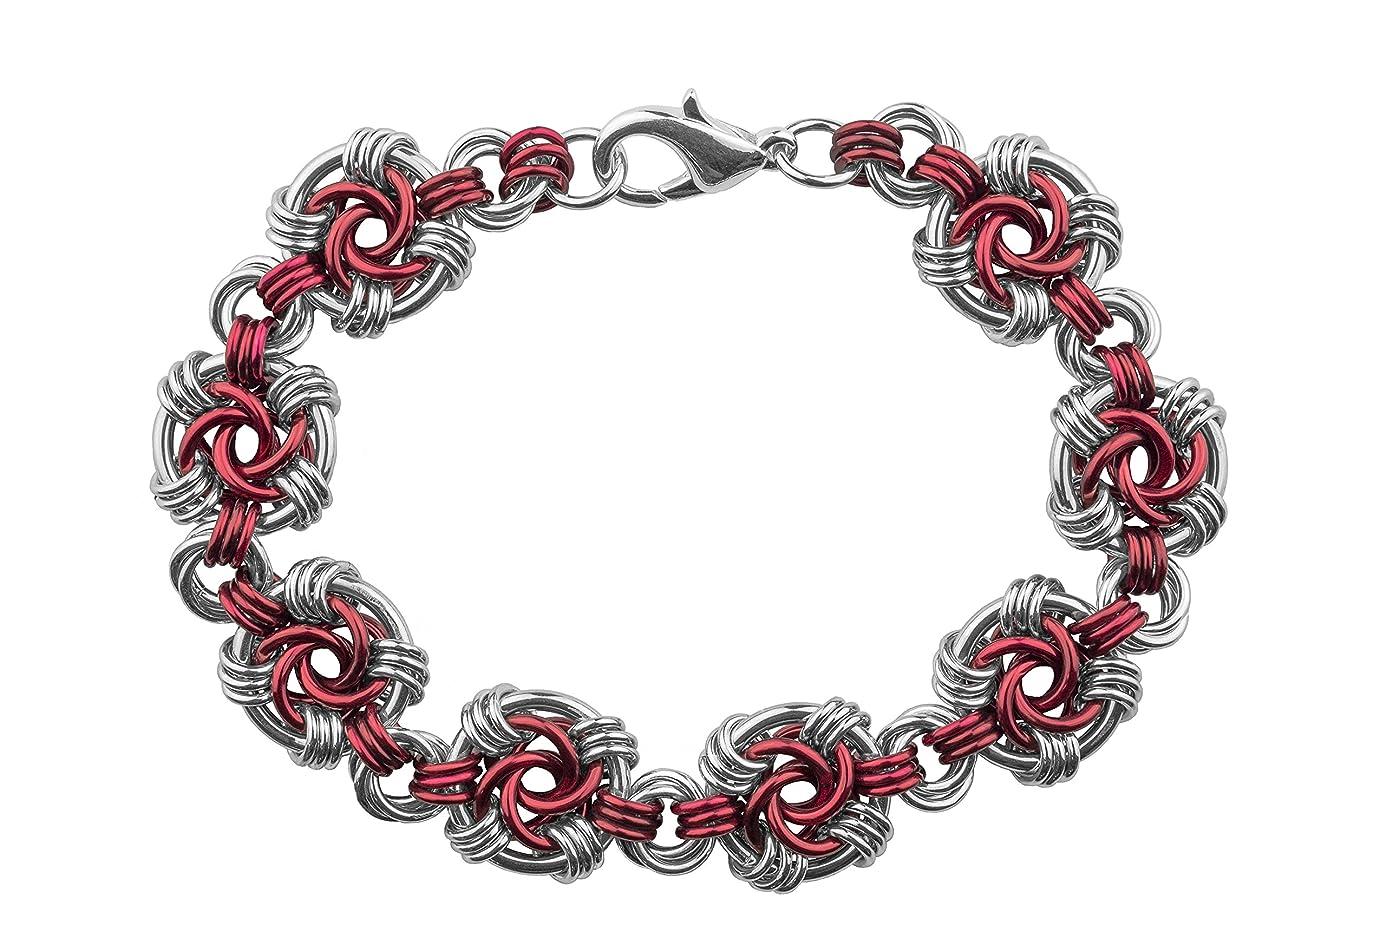 Weave Got Maille Marsala Swirls Chain Maille Bracelet Kit qve5634472